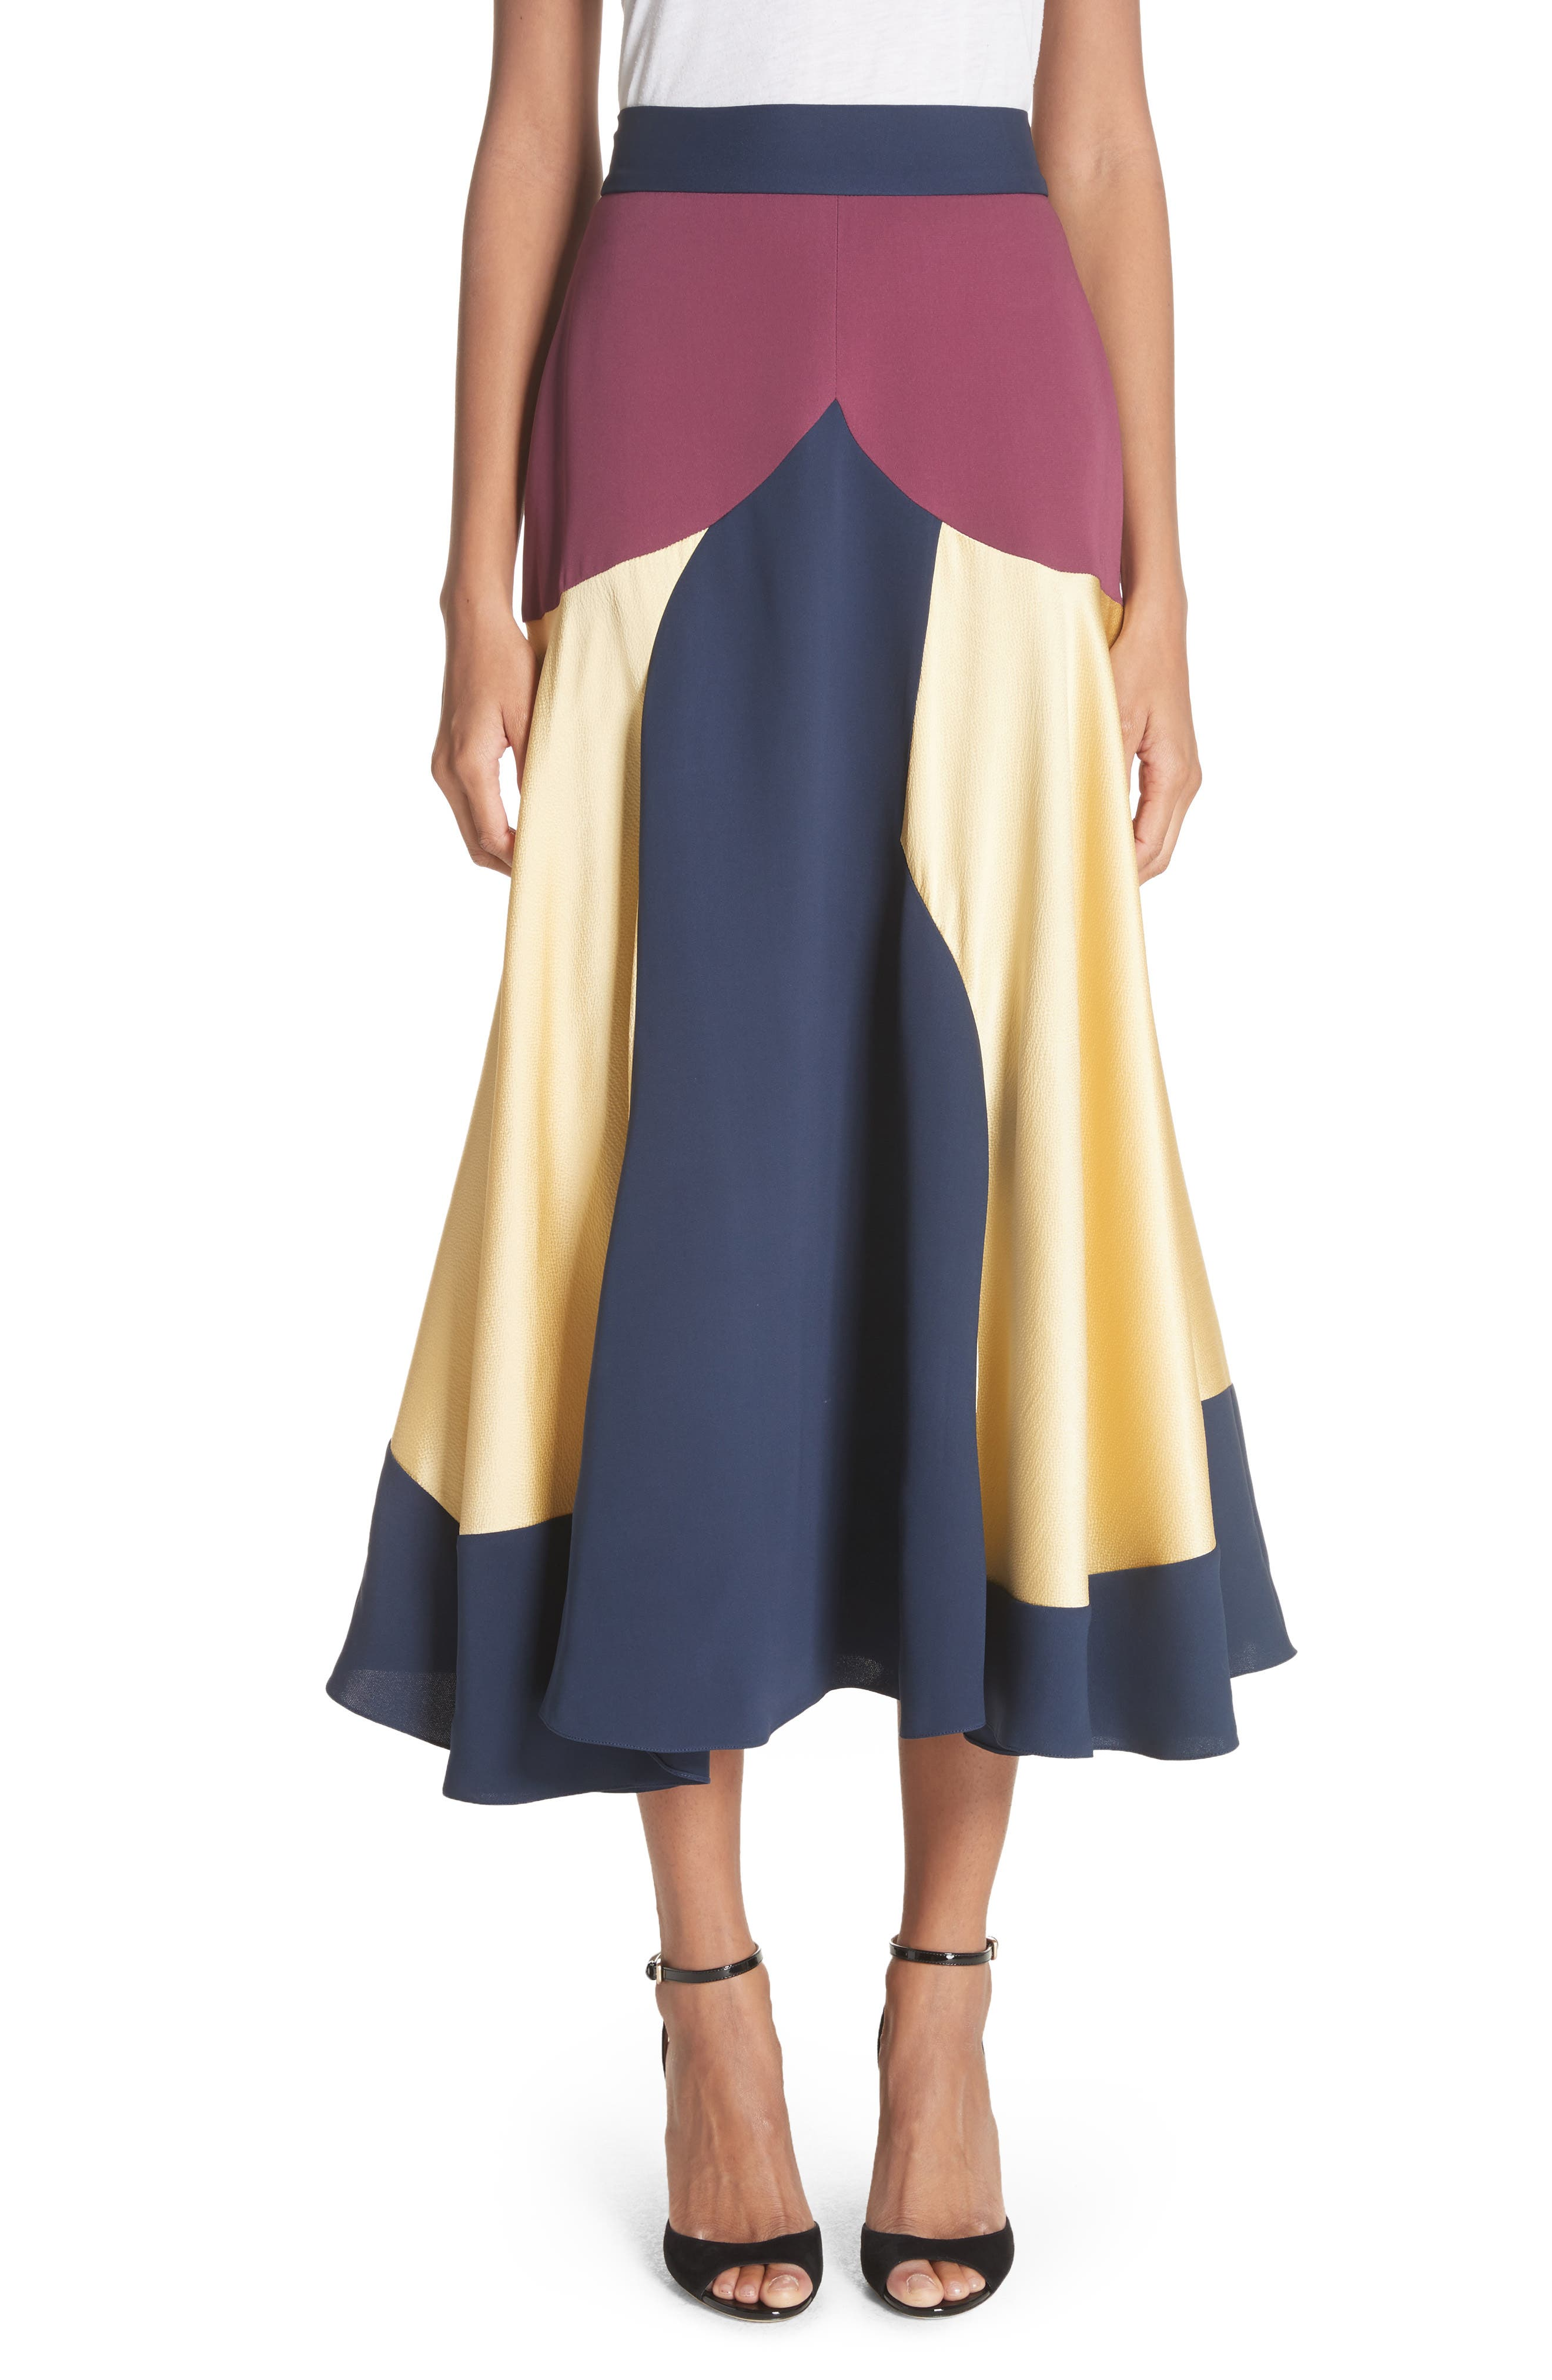 Rania Skirt,                             Main thumbnail 1, color,                             Sorbet/ Plum/ Navy